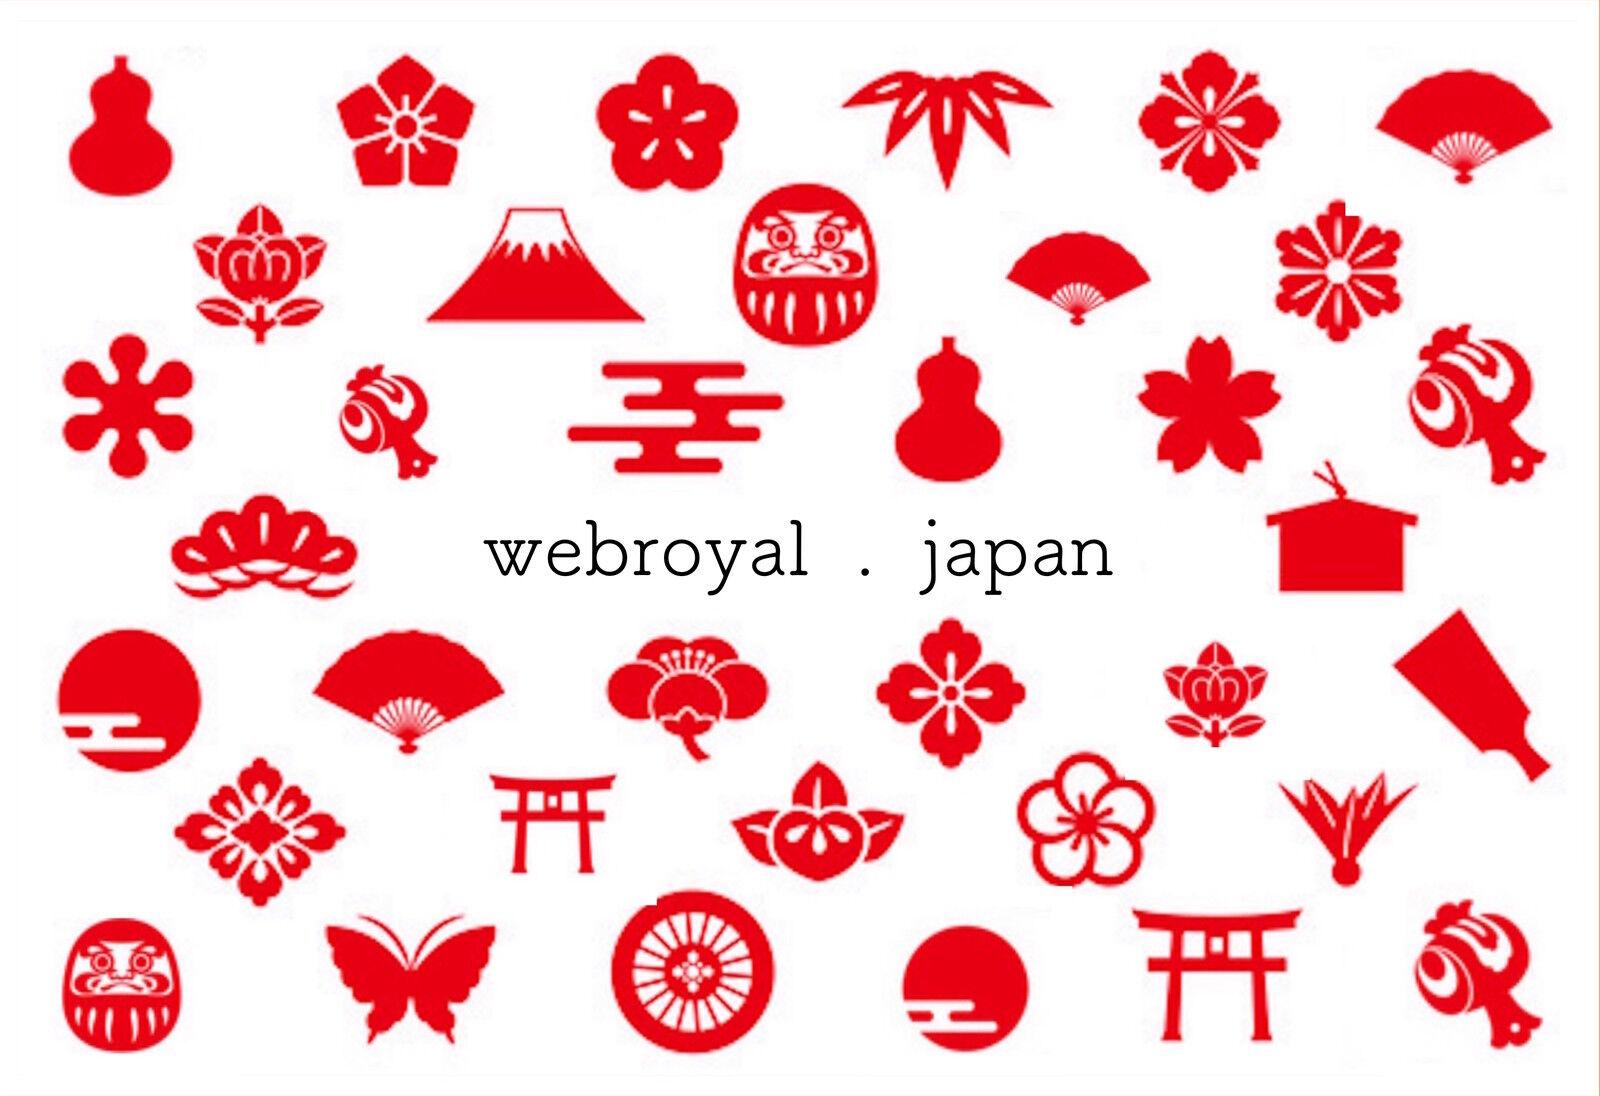 webroyal.japan